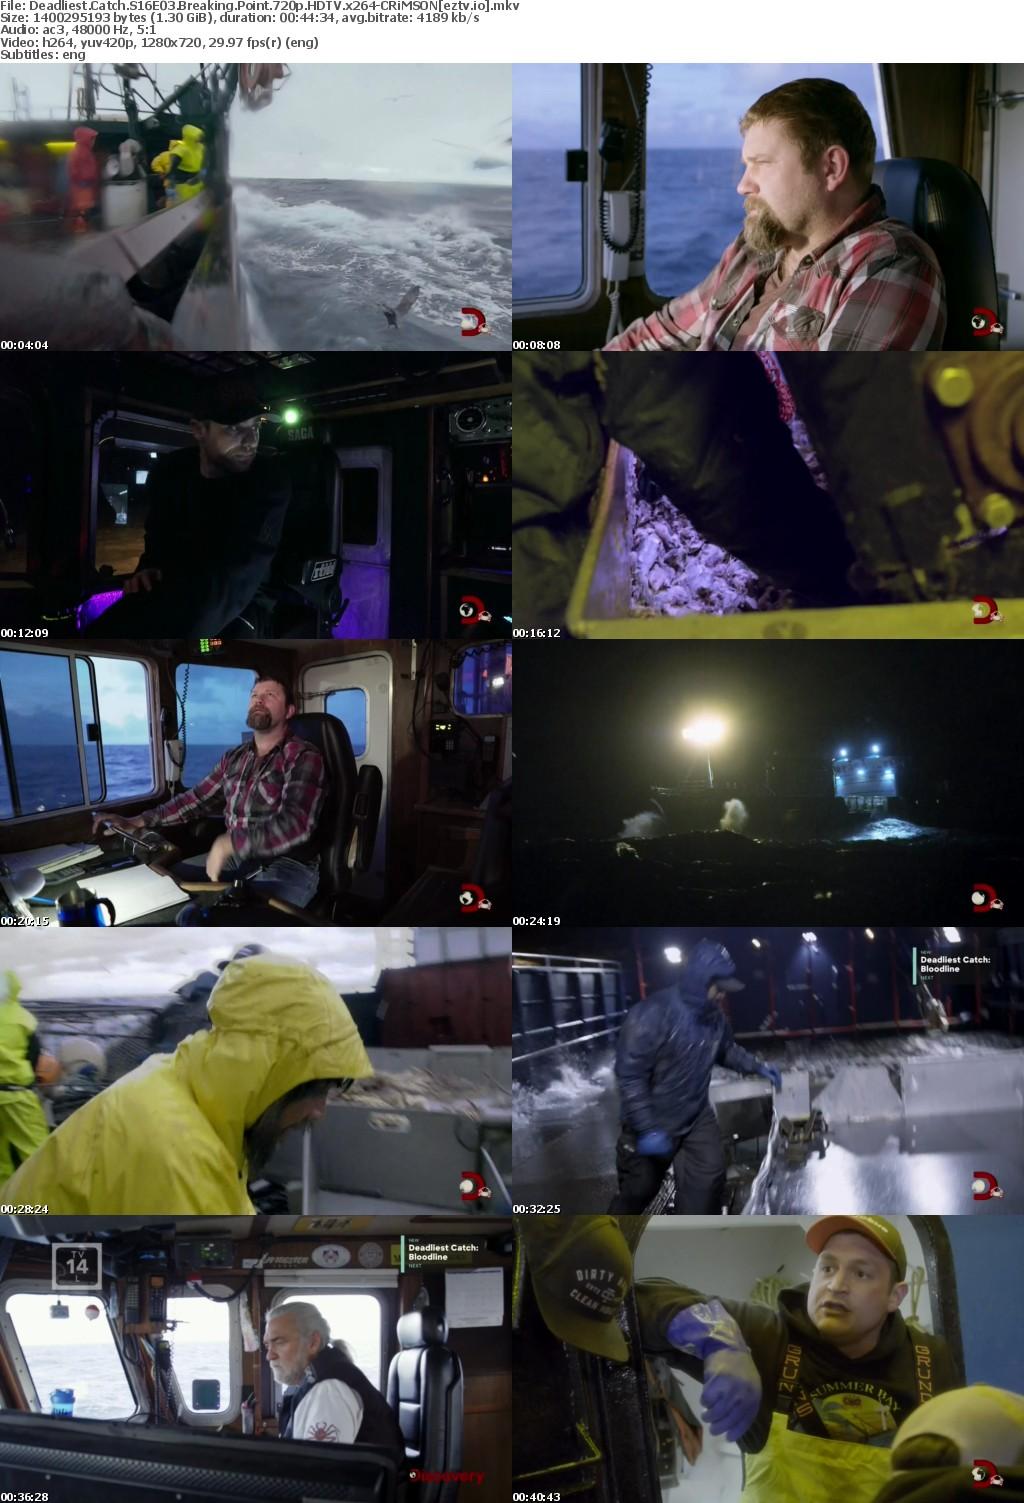 Deadliest Catch S16E03 Breaking Point 720p HDTV x264-CRiMSON